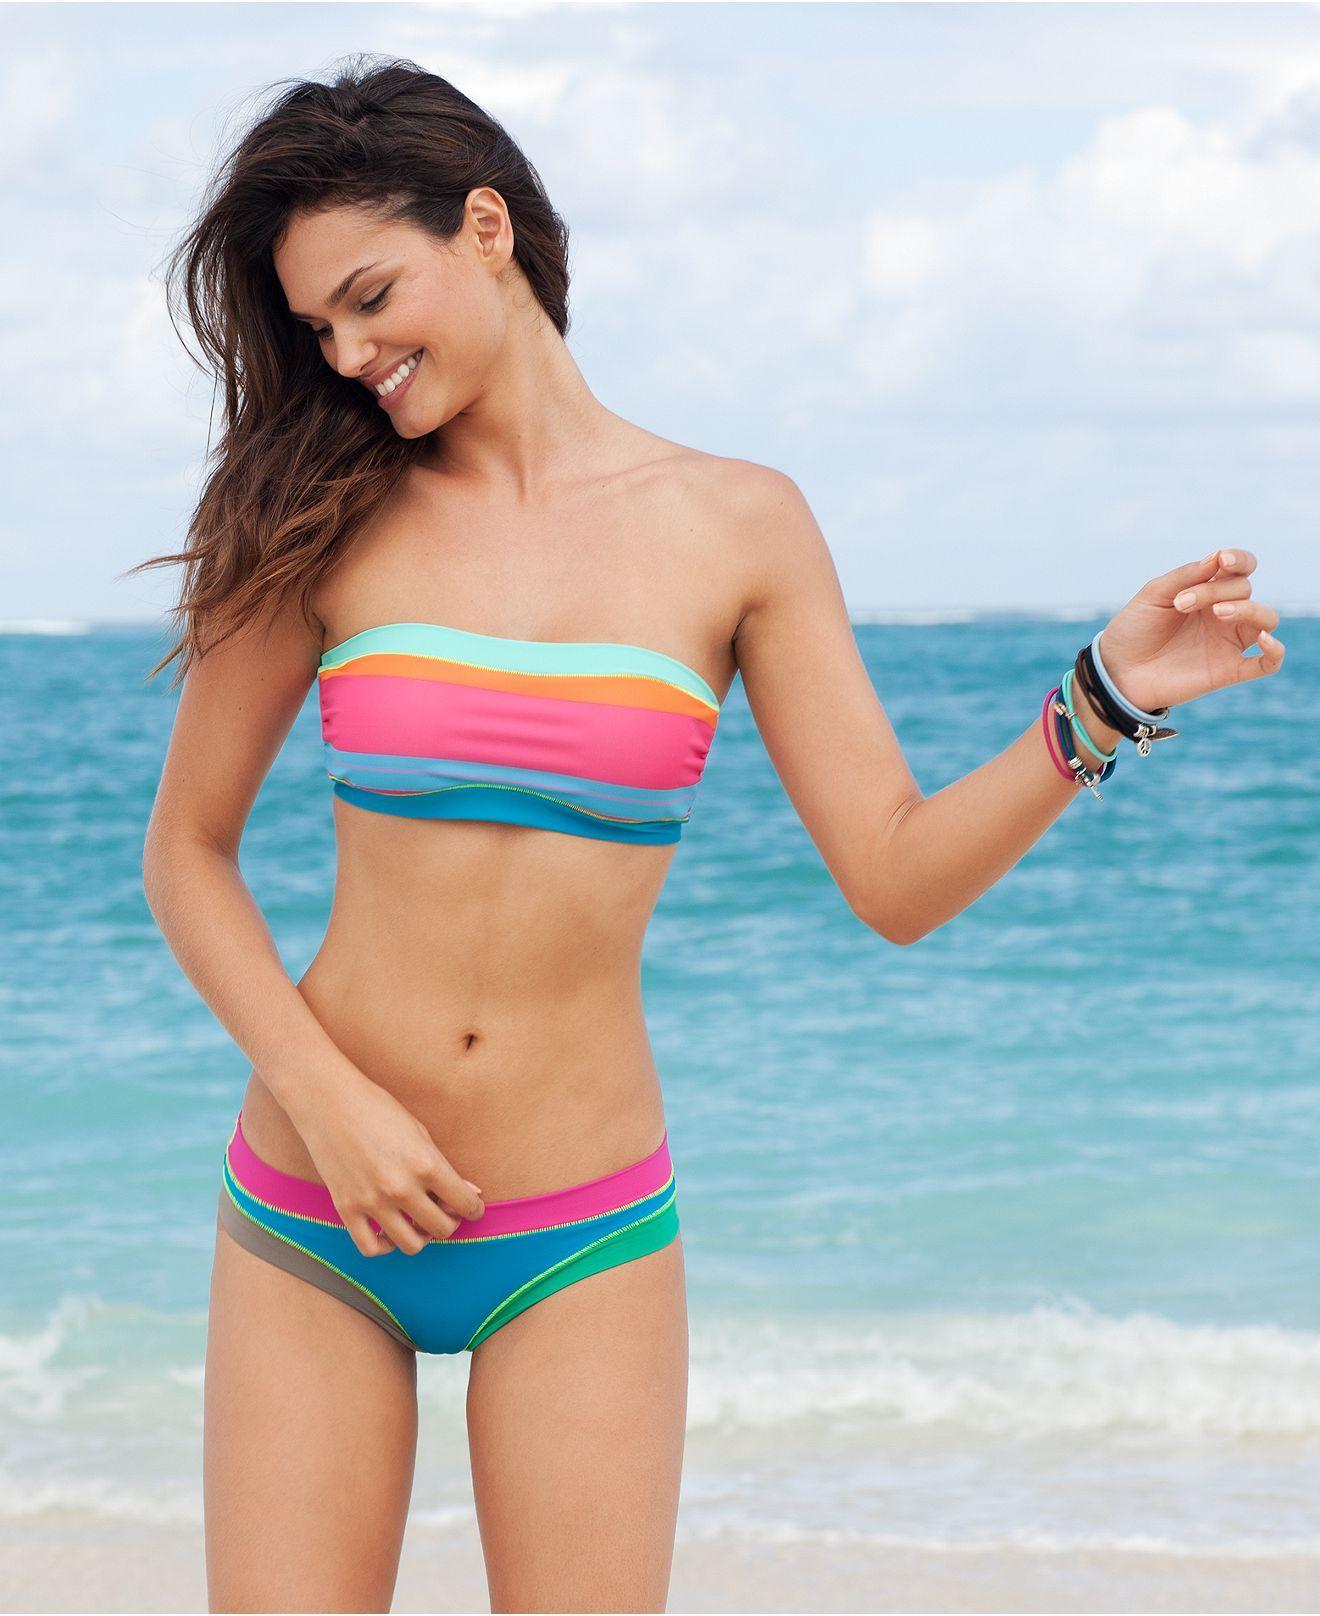 4327a136a3ee8 A.B.S. Swimsuit